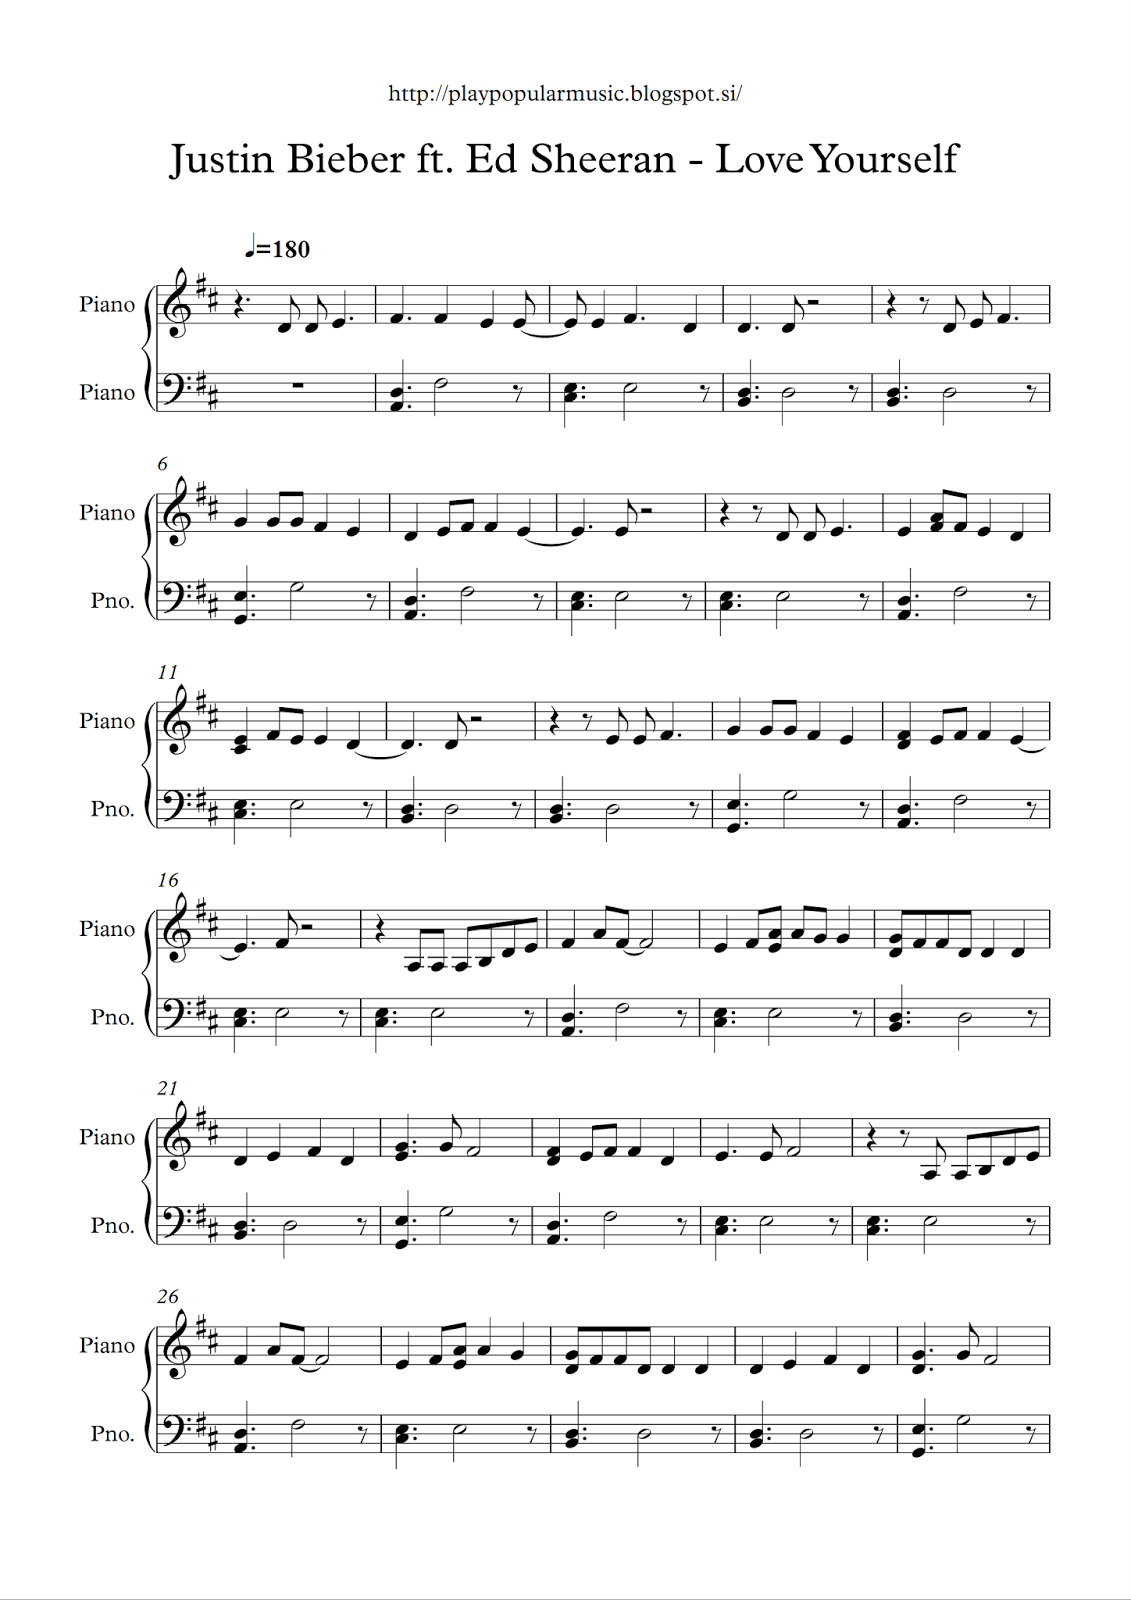 Free Piano Sheet Music Love Yourself Justin Bieber Ft Ed Sheeran Pdf My Favourite Sentence Fro Piano Sheet Music Free Trumpet Sheet Music Piano Music